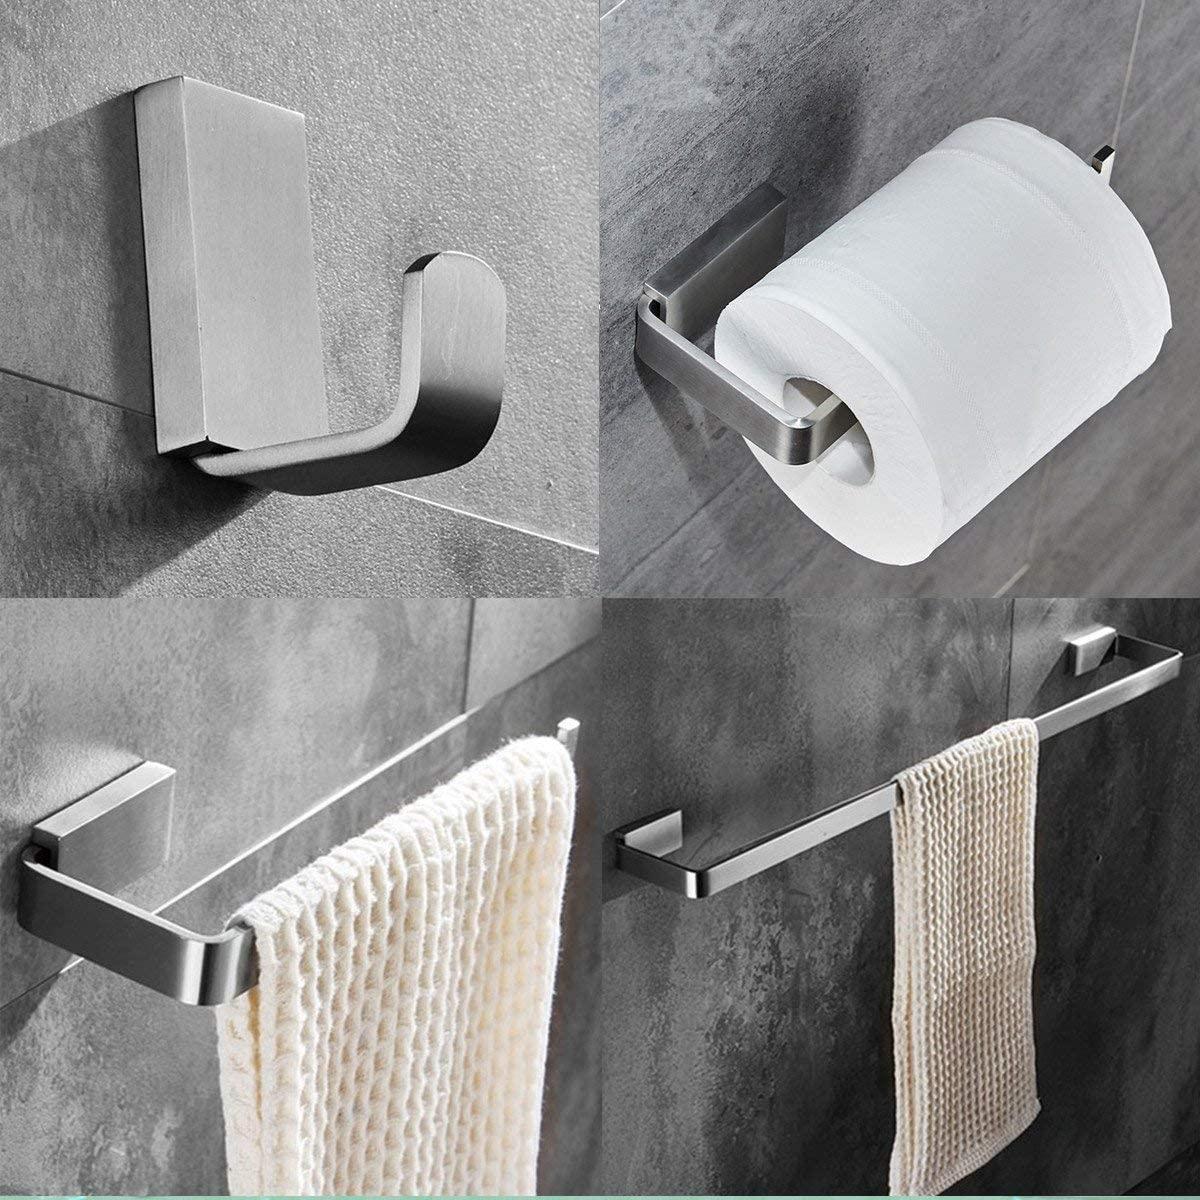 ELLO&ALLO Brushed Nickel Bathroom Hardware Set,Stainless Steel Towel Bar Wall Mounted Bath Accessories Set